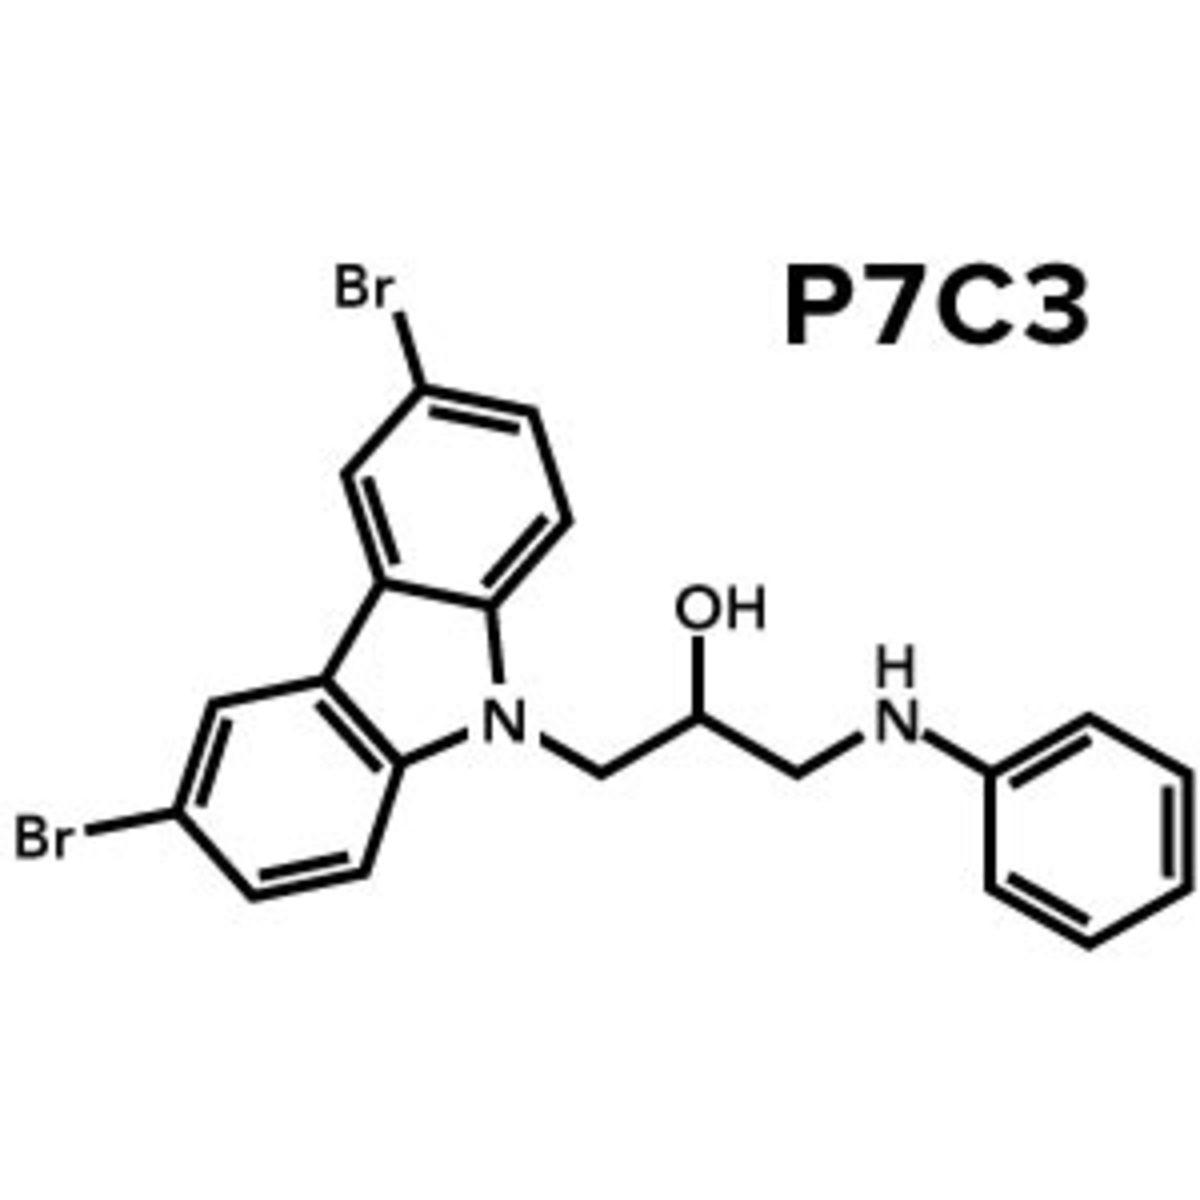 P7C3 compound chemical structure